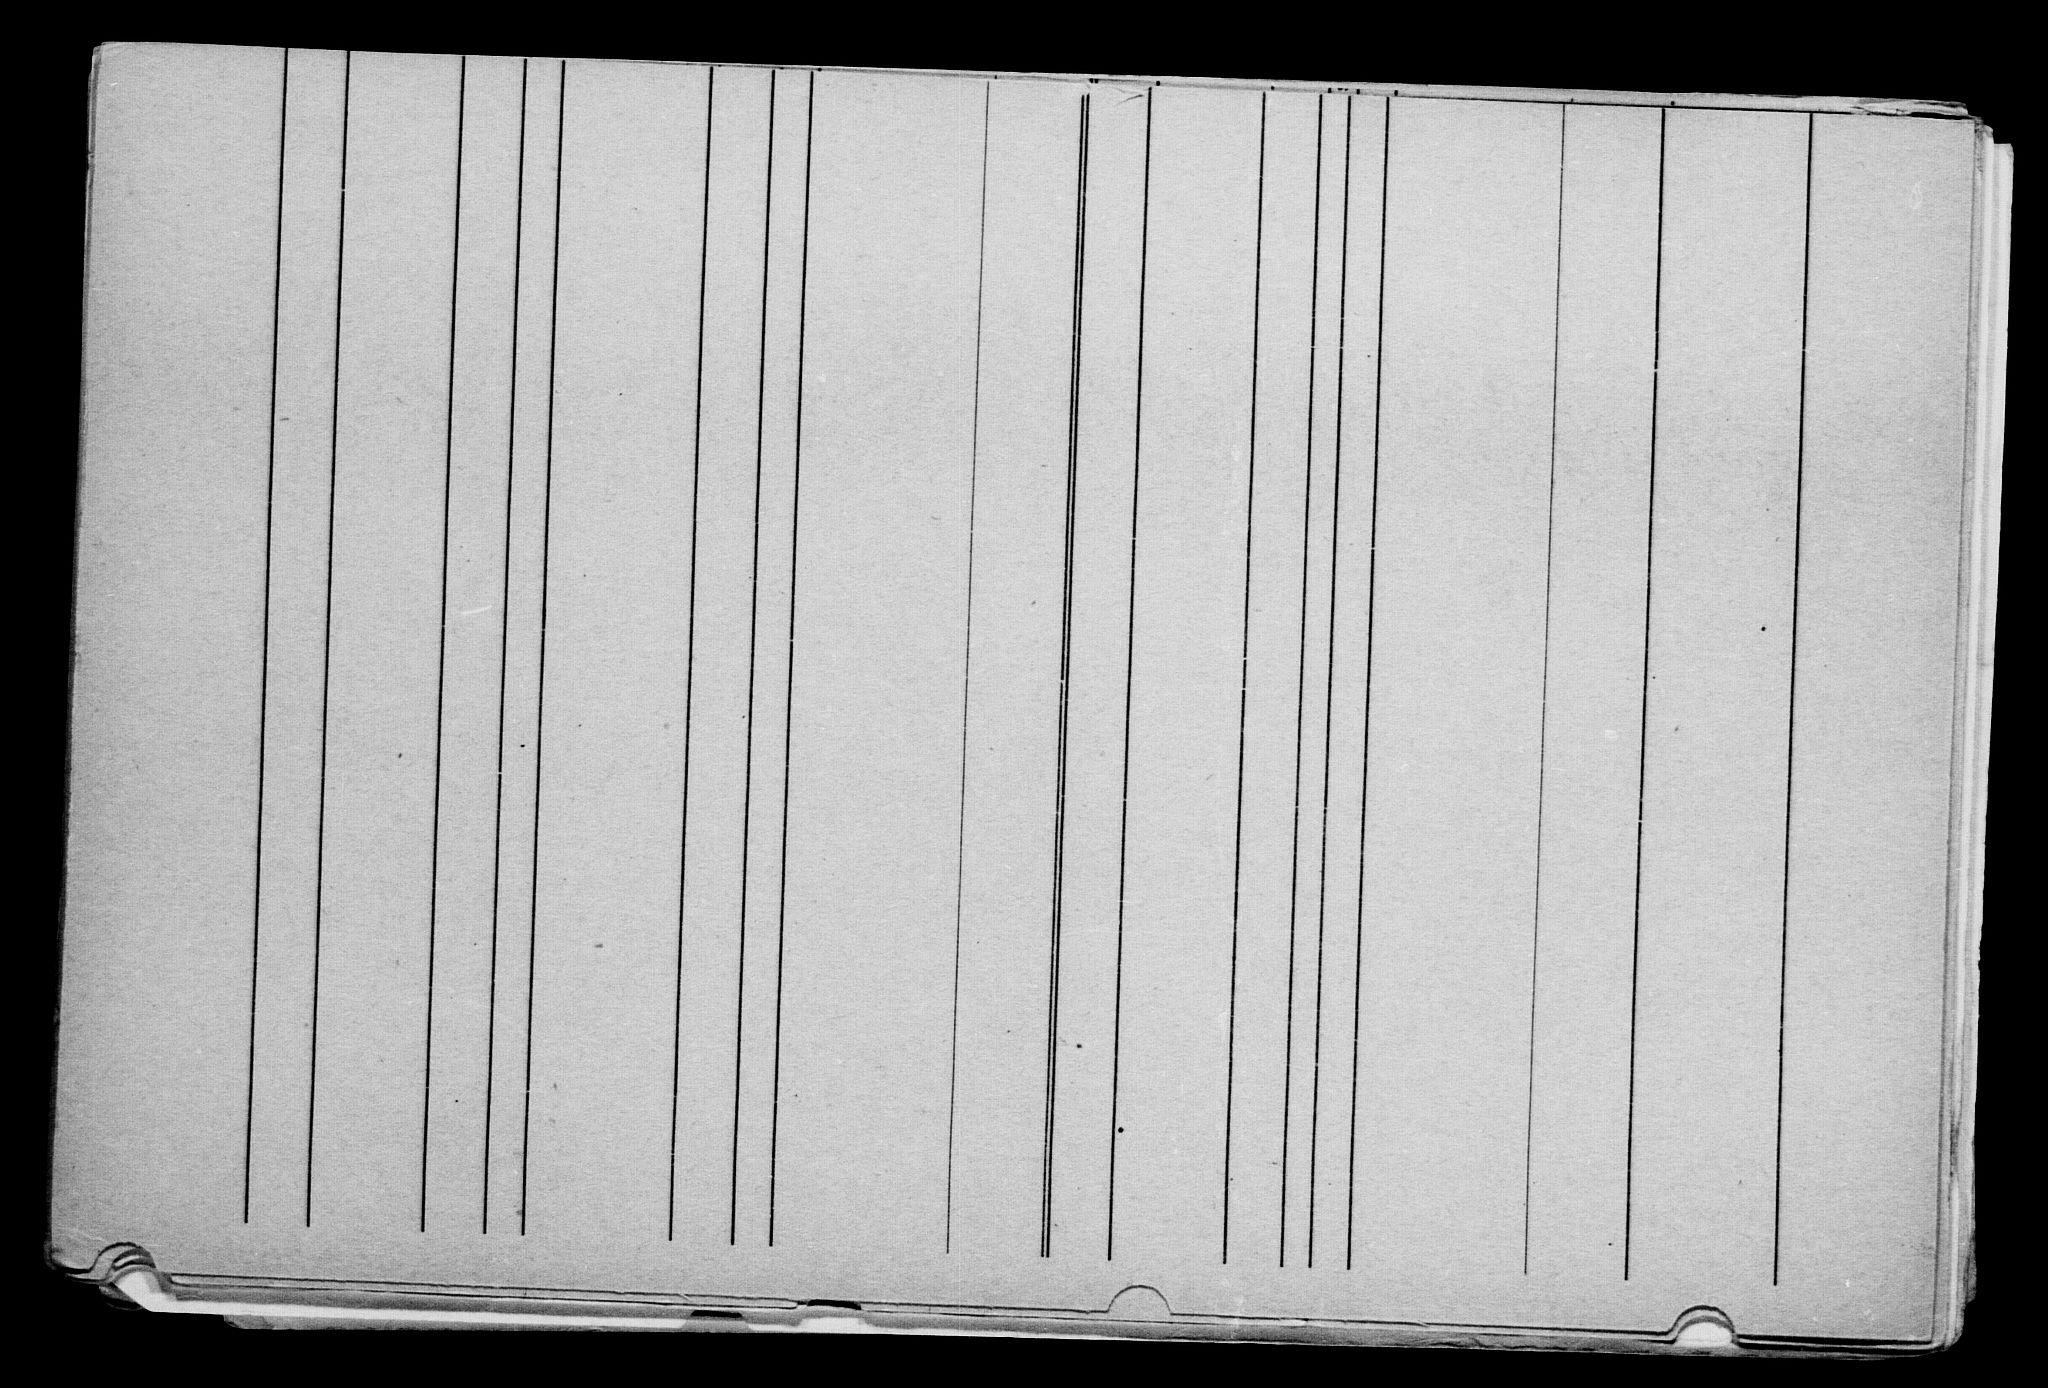 RA, Direktoratet for sjømenn, G/Gb/L0002: Hovedkort, 1883-1885, s. 196